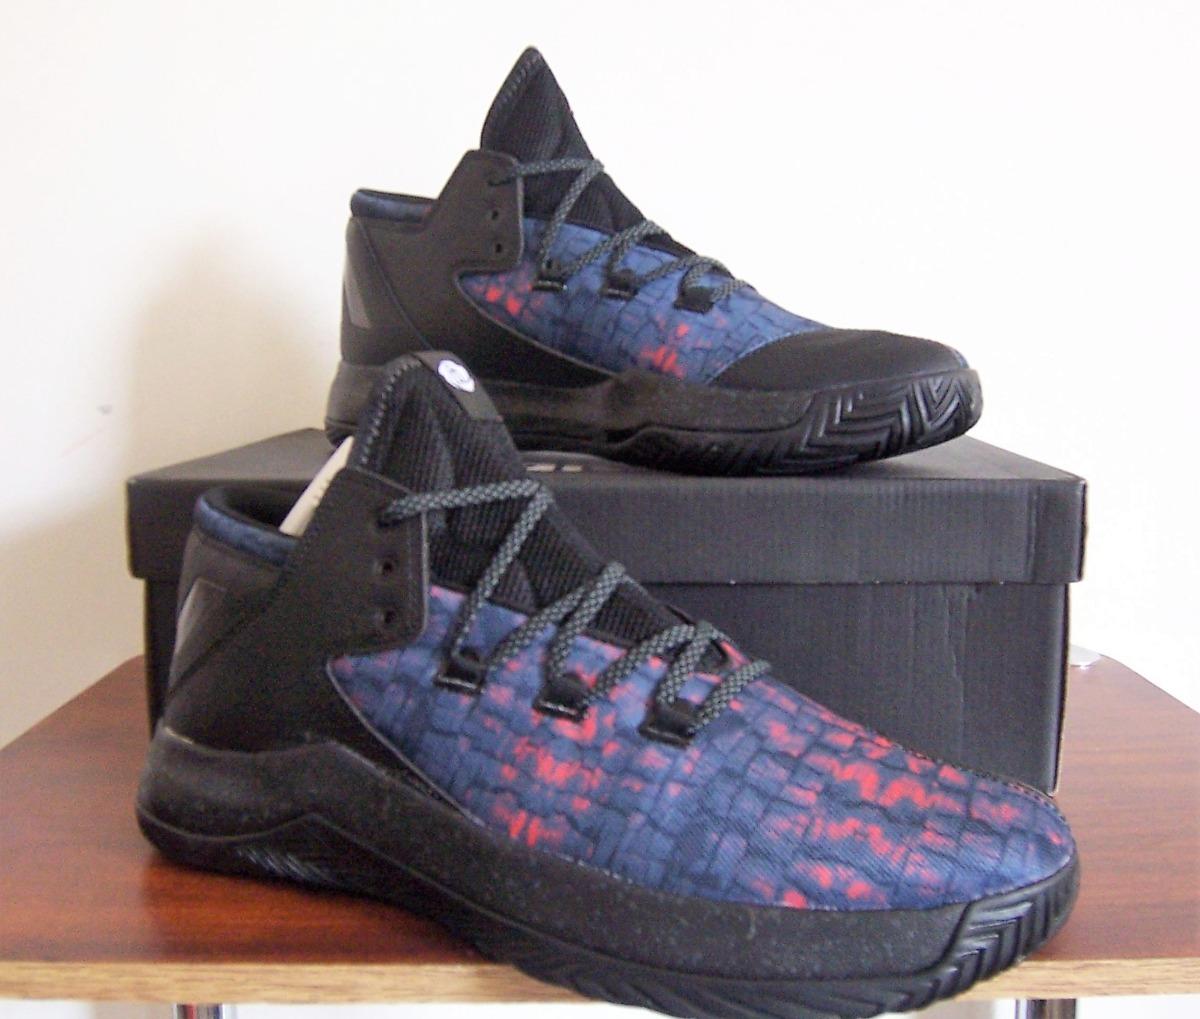 low priced c8d45 0dcf4 zapatillas botas basquet adidas derrick rose menace 2-envios. Cargando zoom.